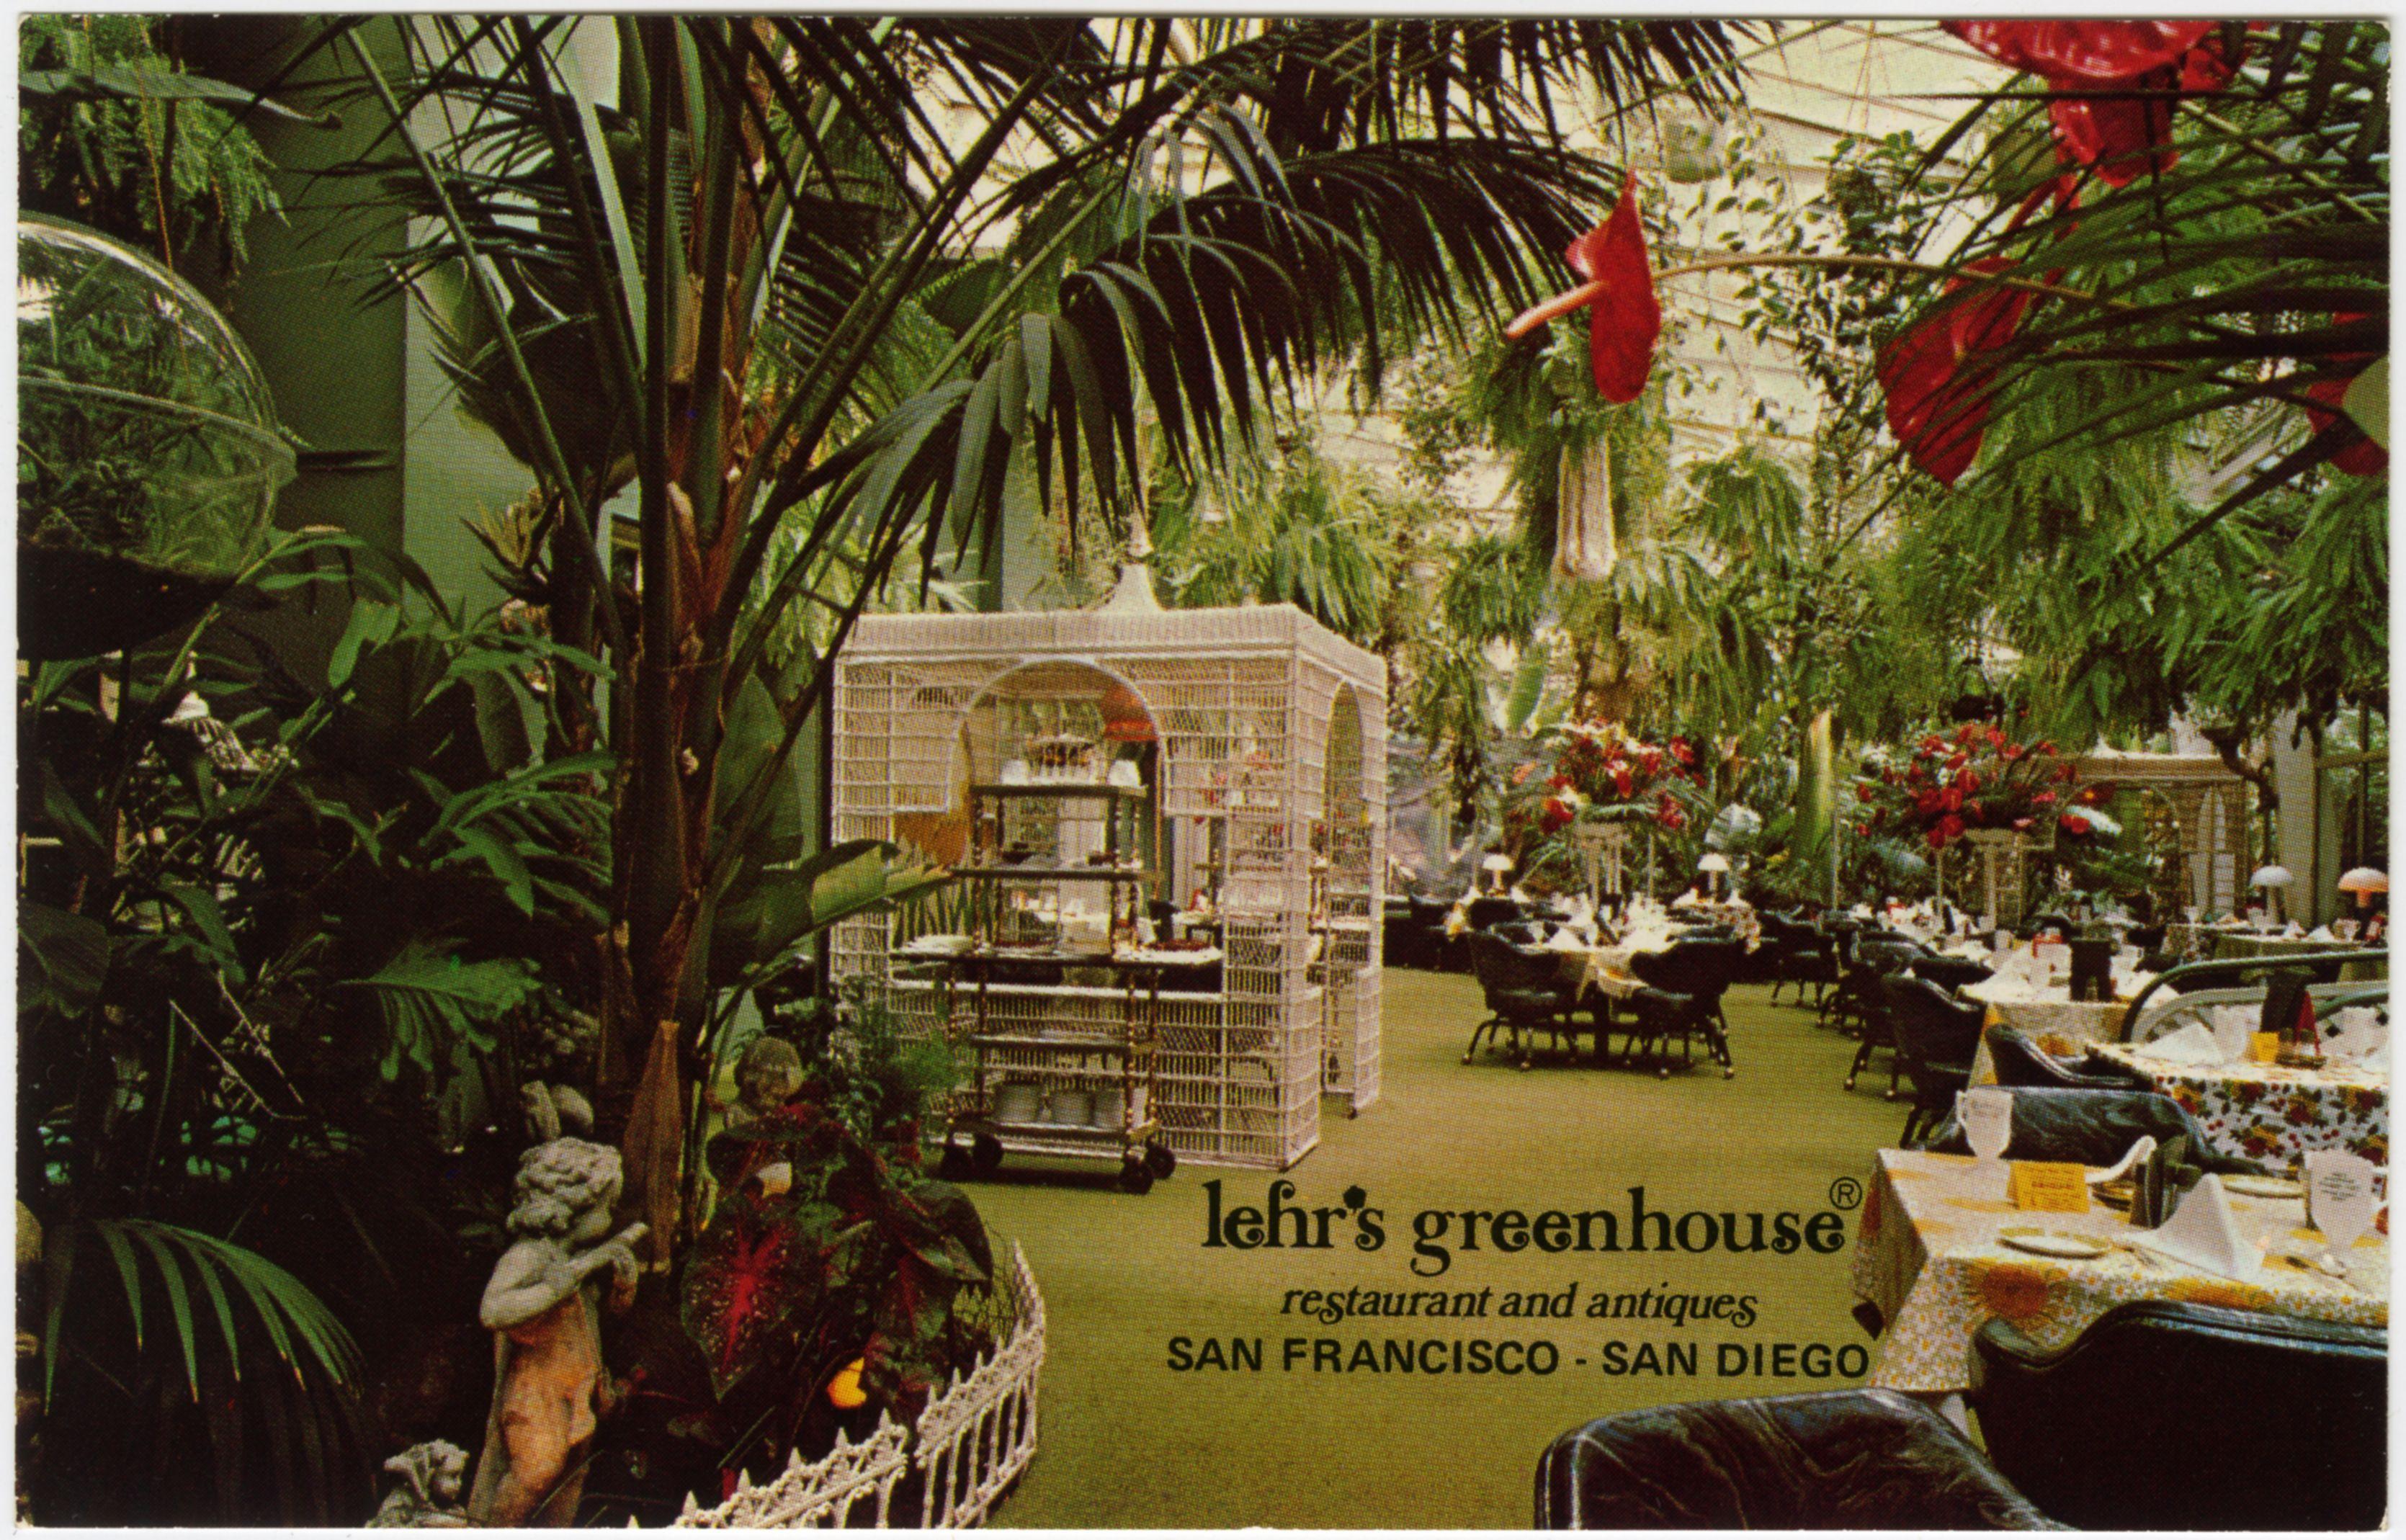 Lehr's Greenhouse Restaurant & Antiques in San Francisco